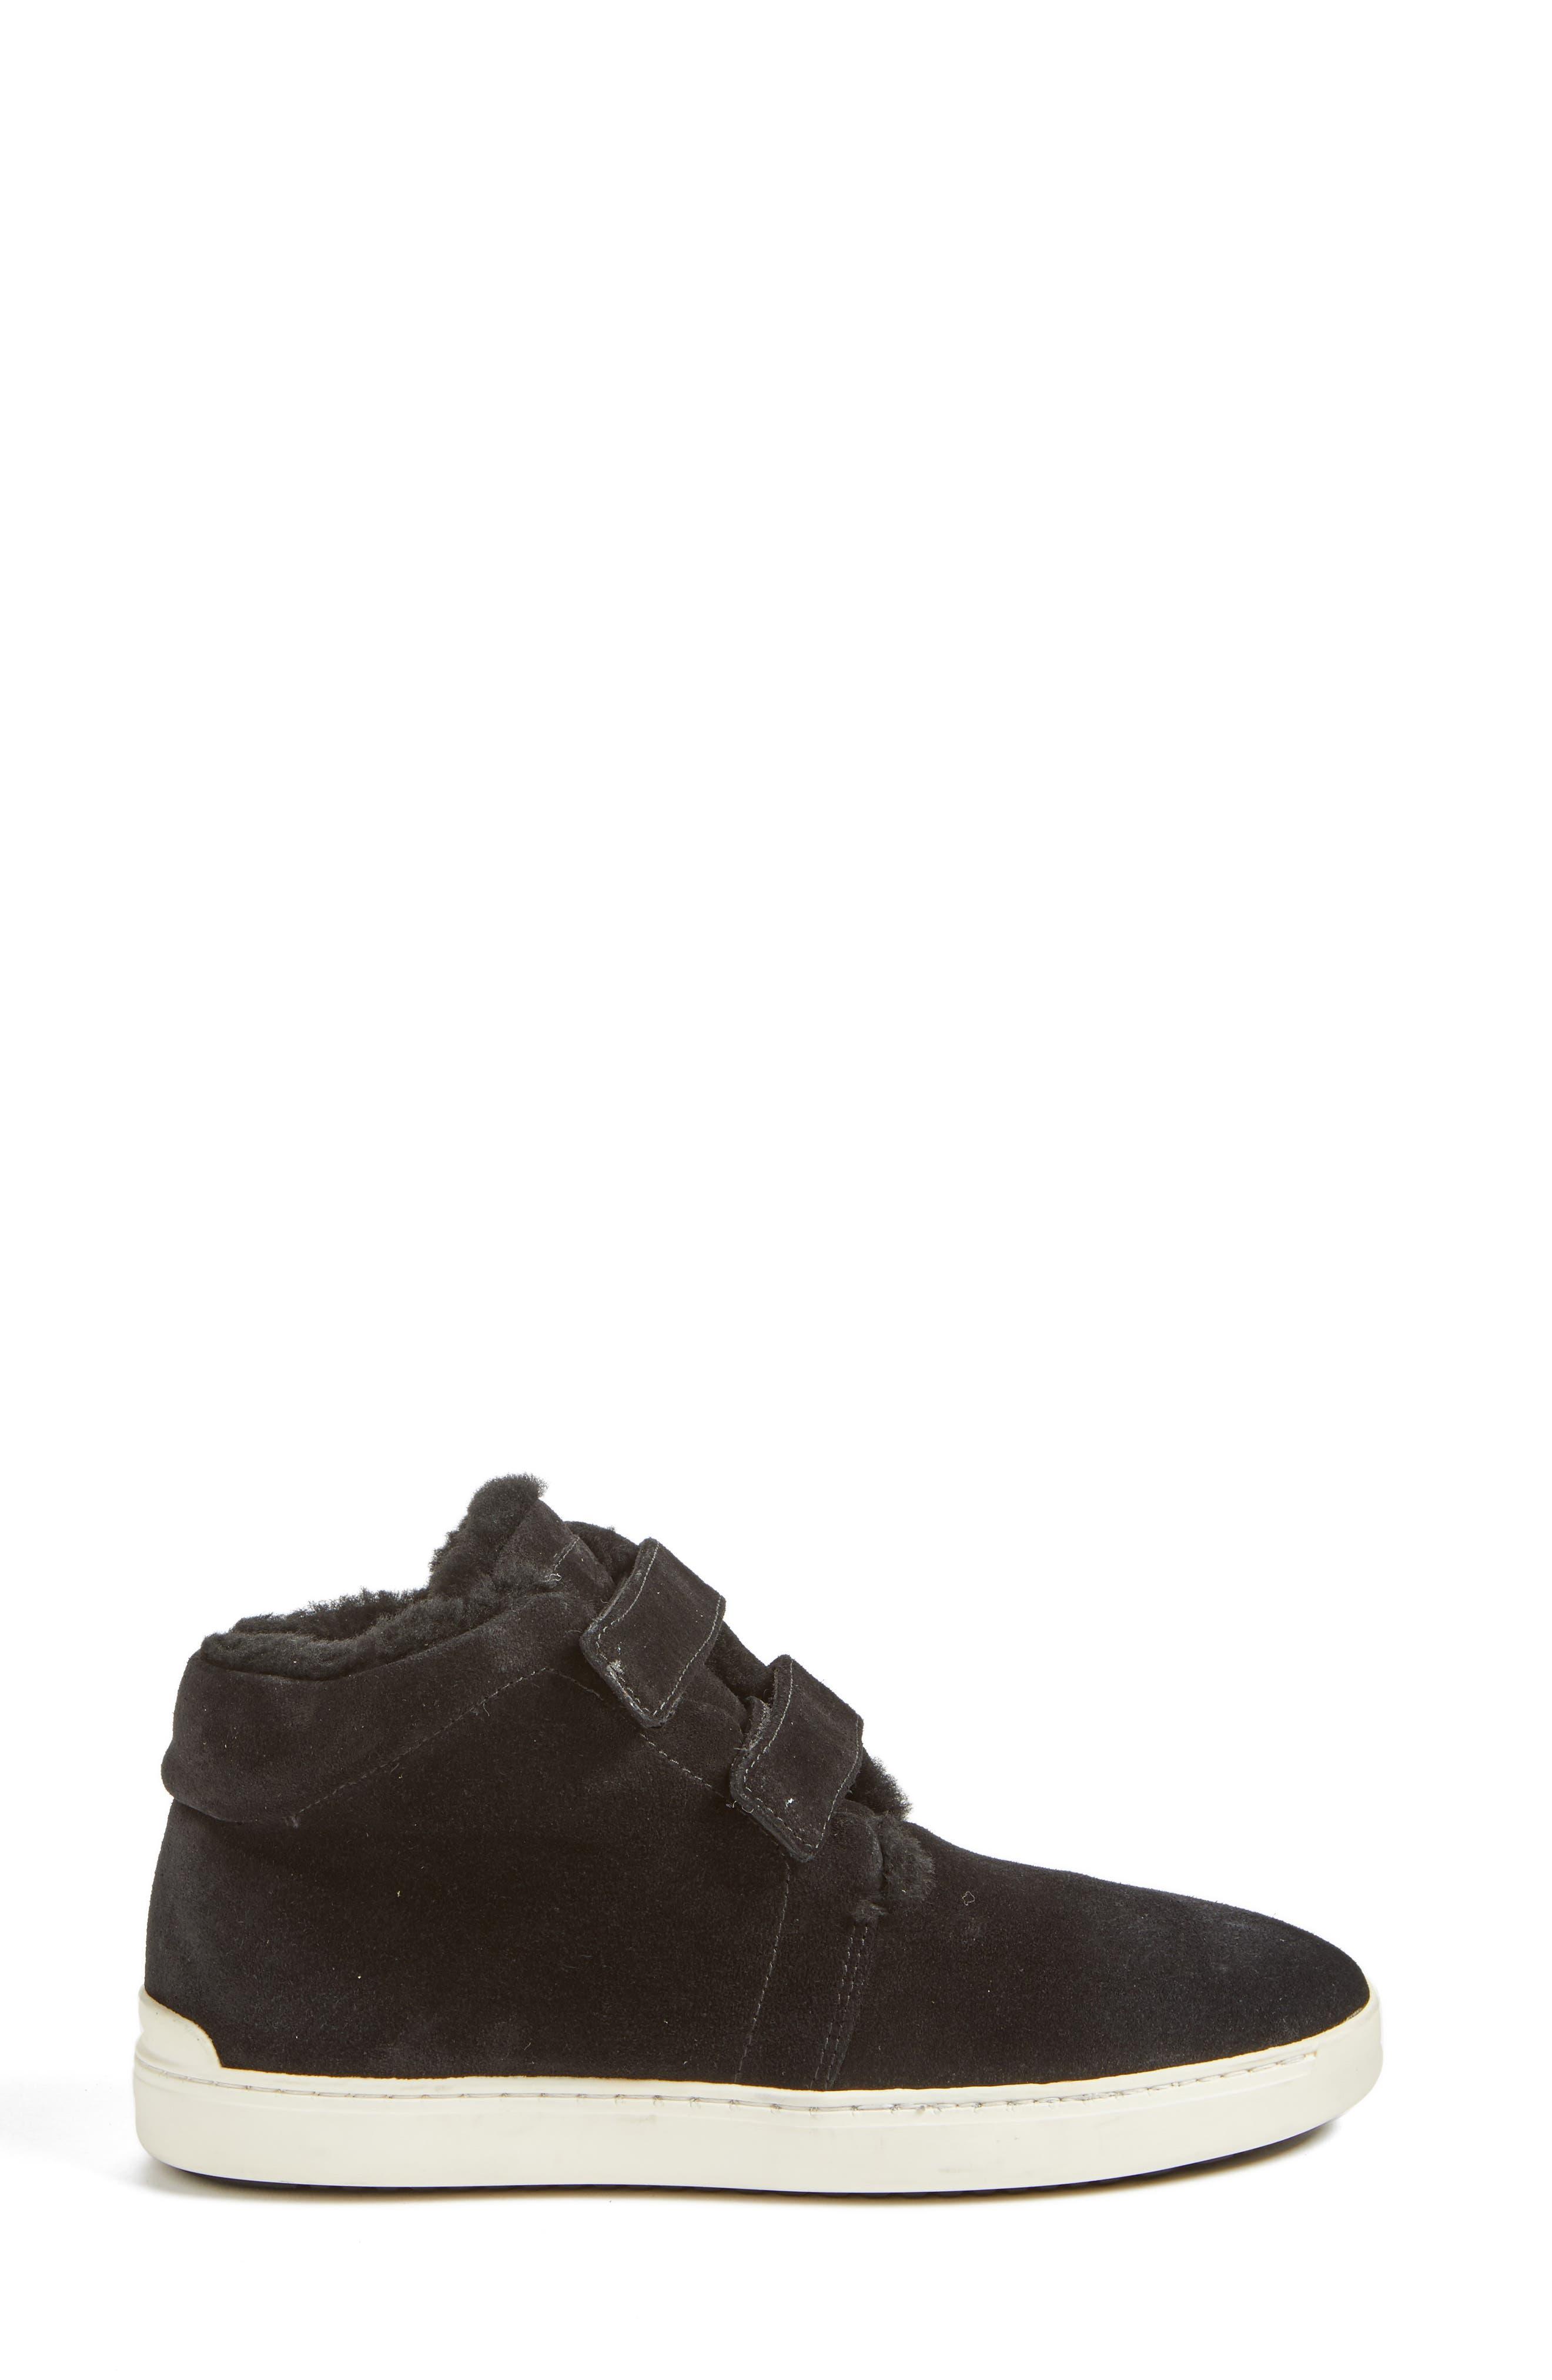 Kent Genuine Shearling Lined Sneaker,                             Alternate thumbnail 3, color,                             008